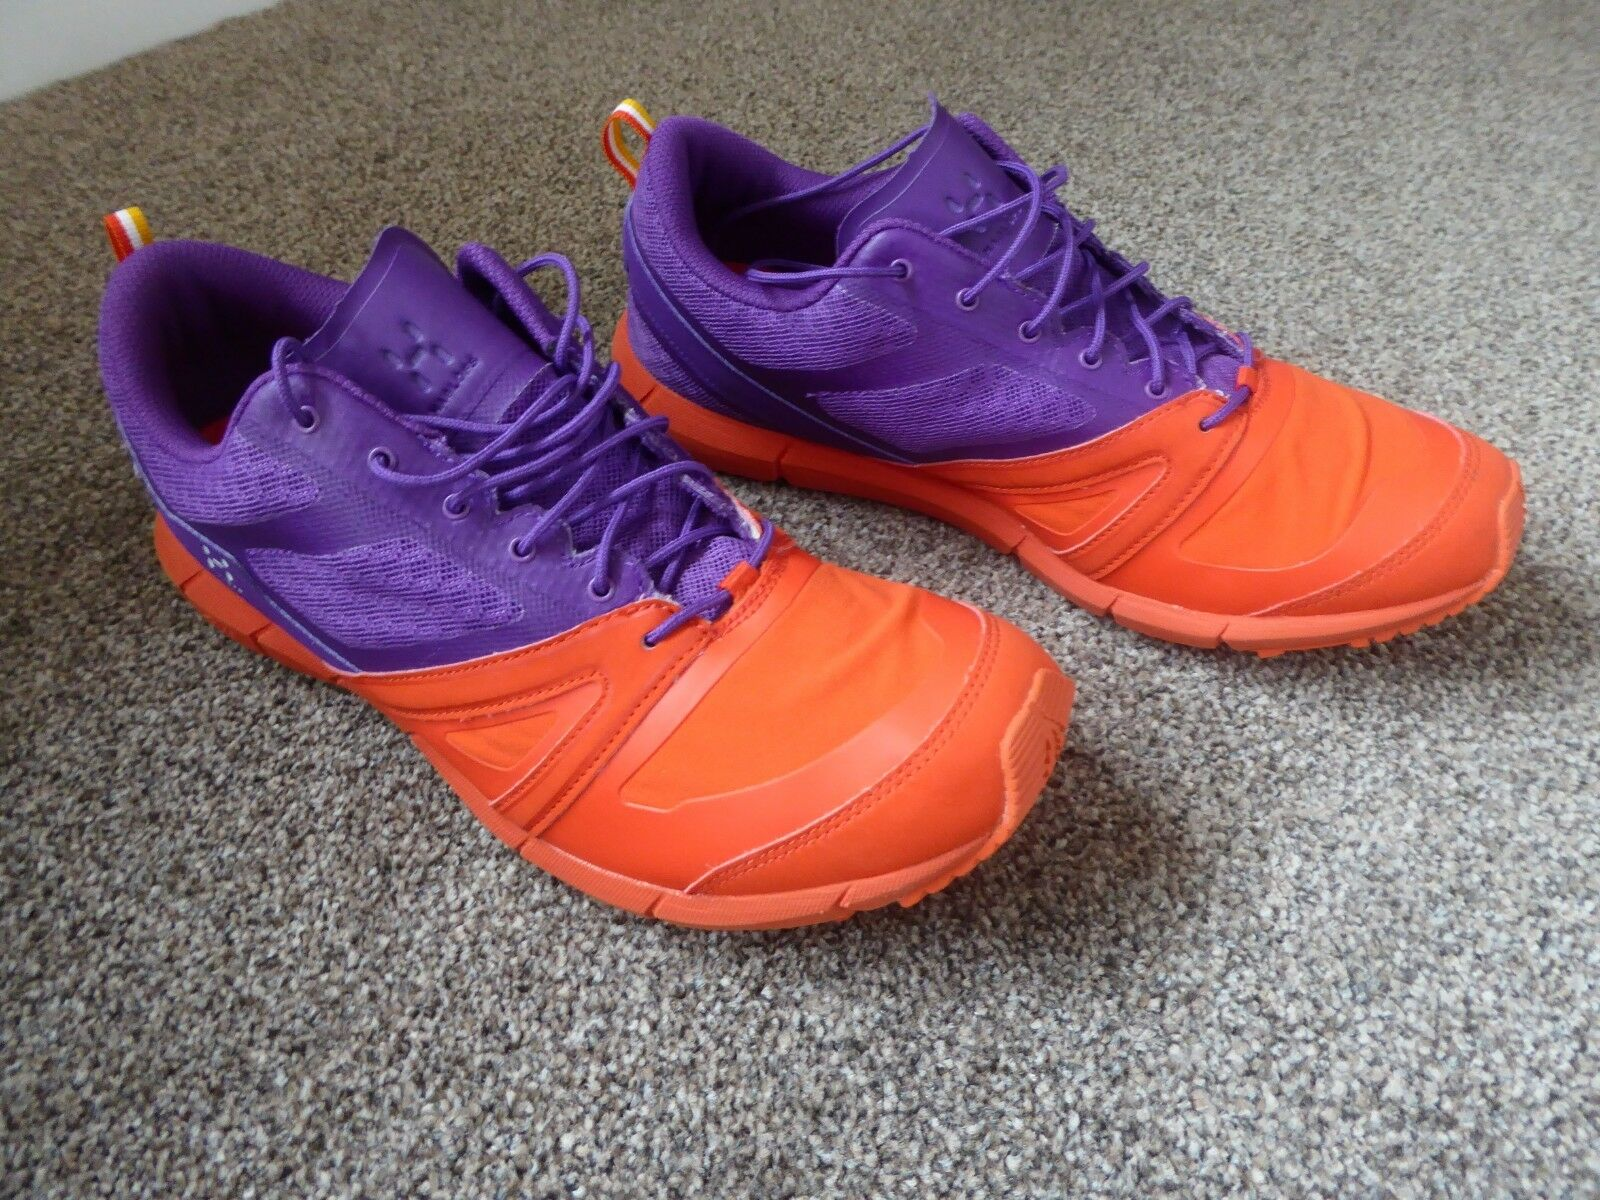 Haglofs LIM Gel Trail Running Hiking shoes UK 7.5 Lightweight Trekking